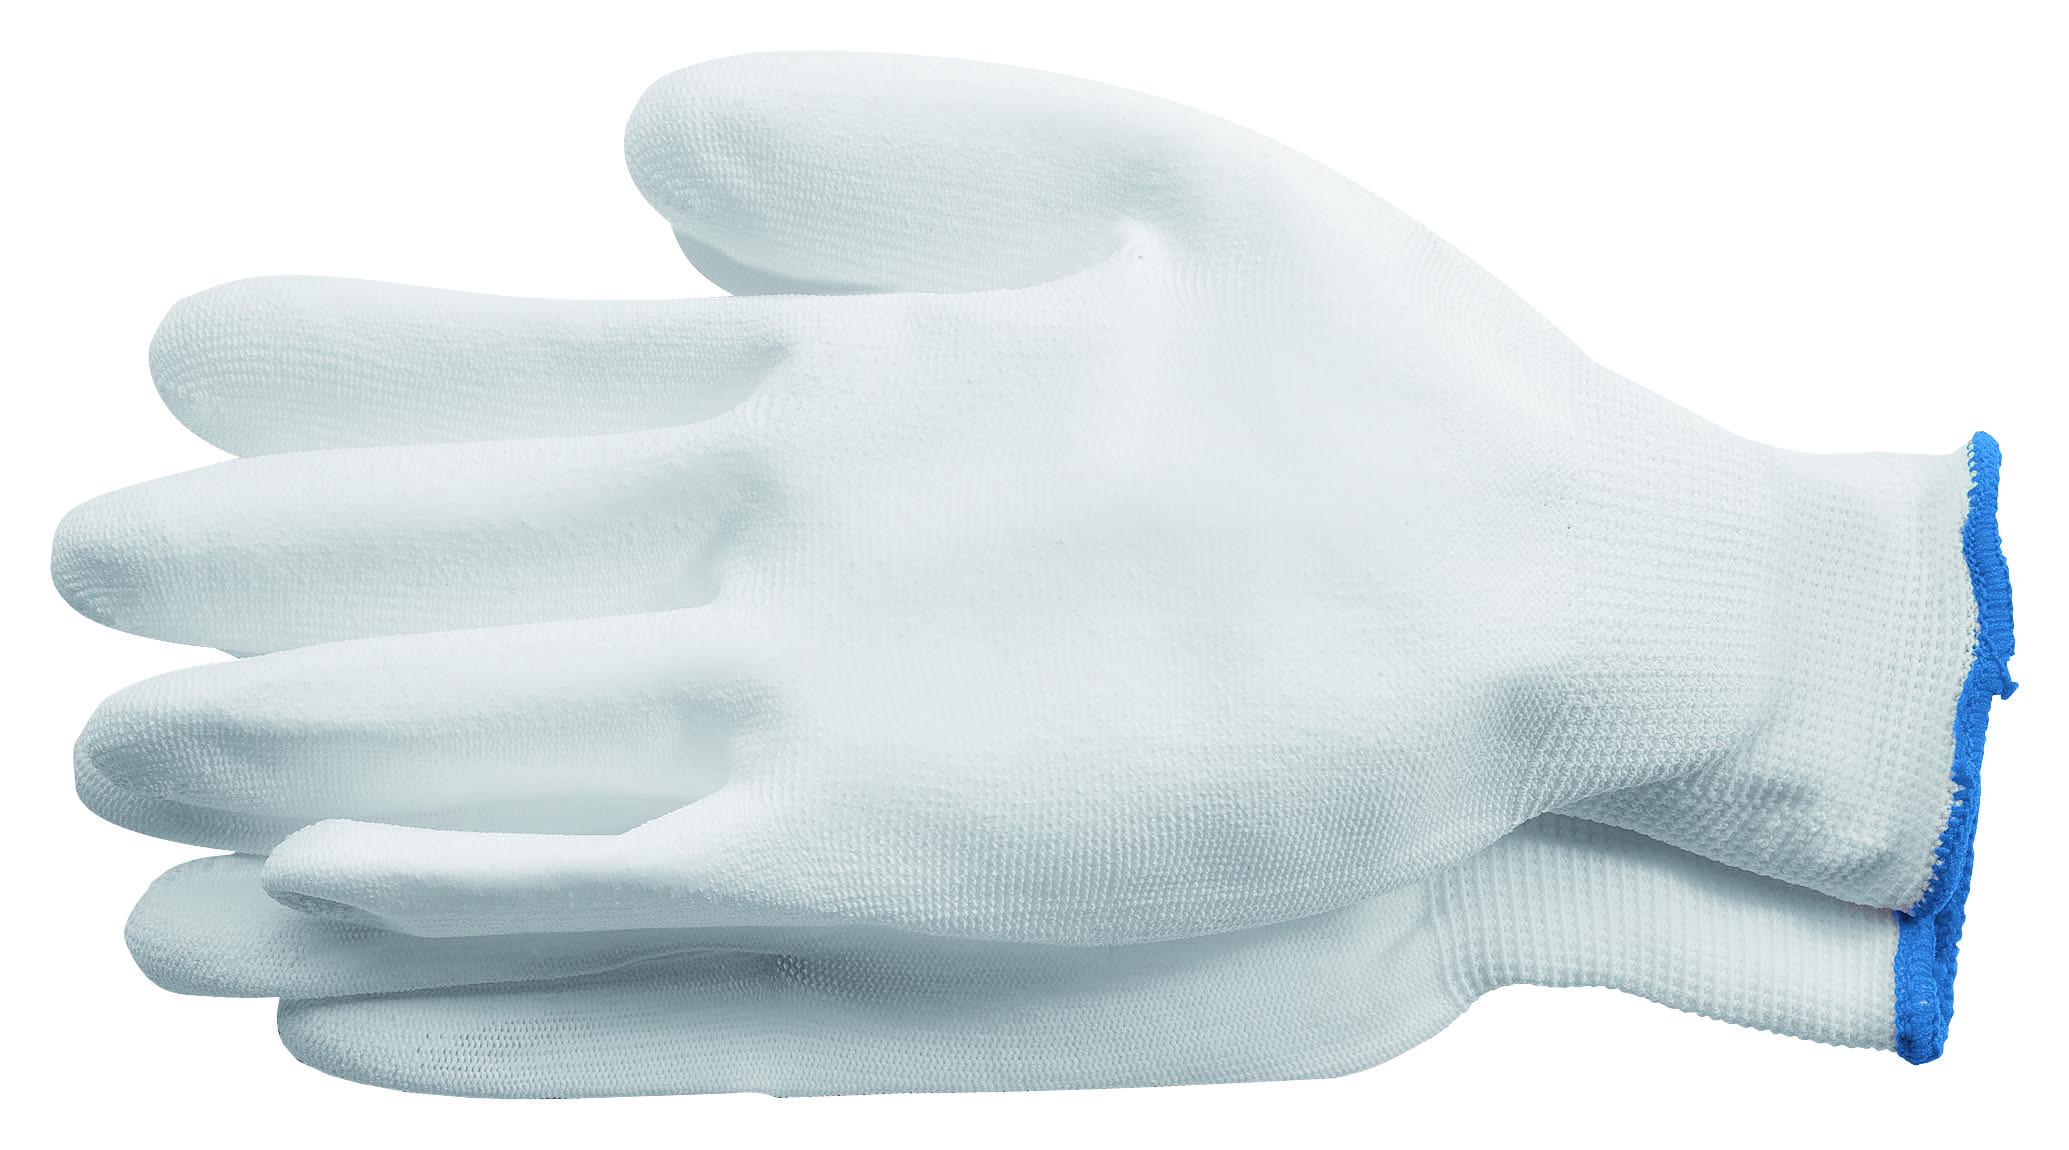 STORCH Nylon-Handschuhe PU beschichtet Größe: XL/10